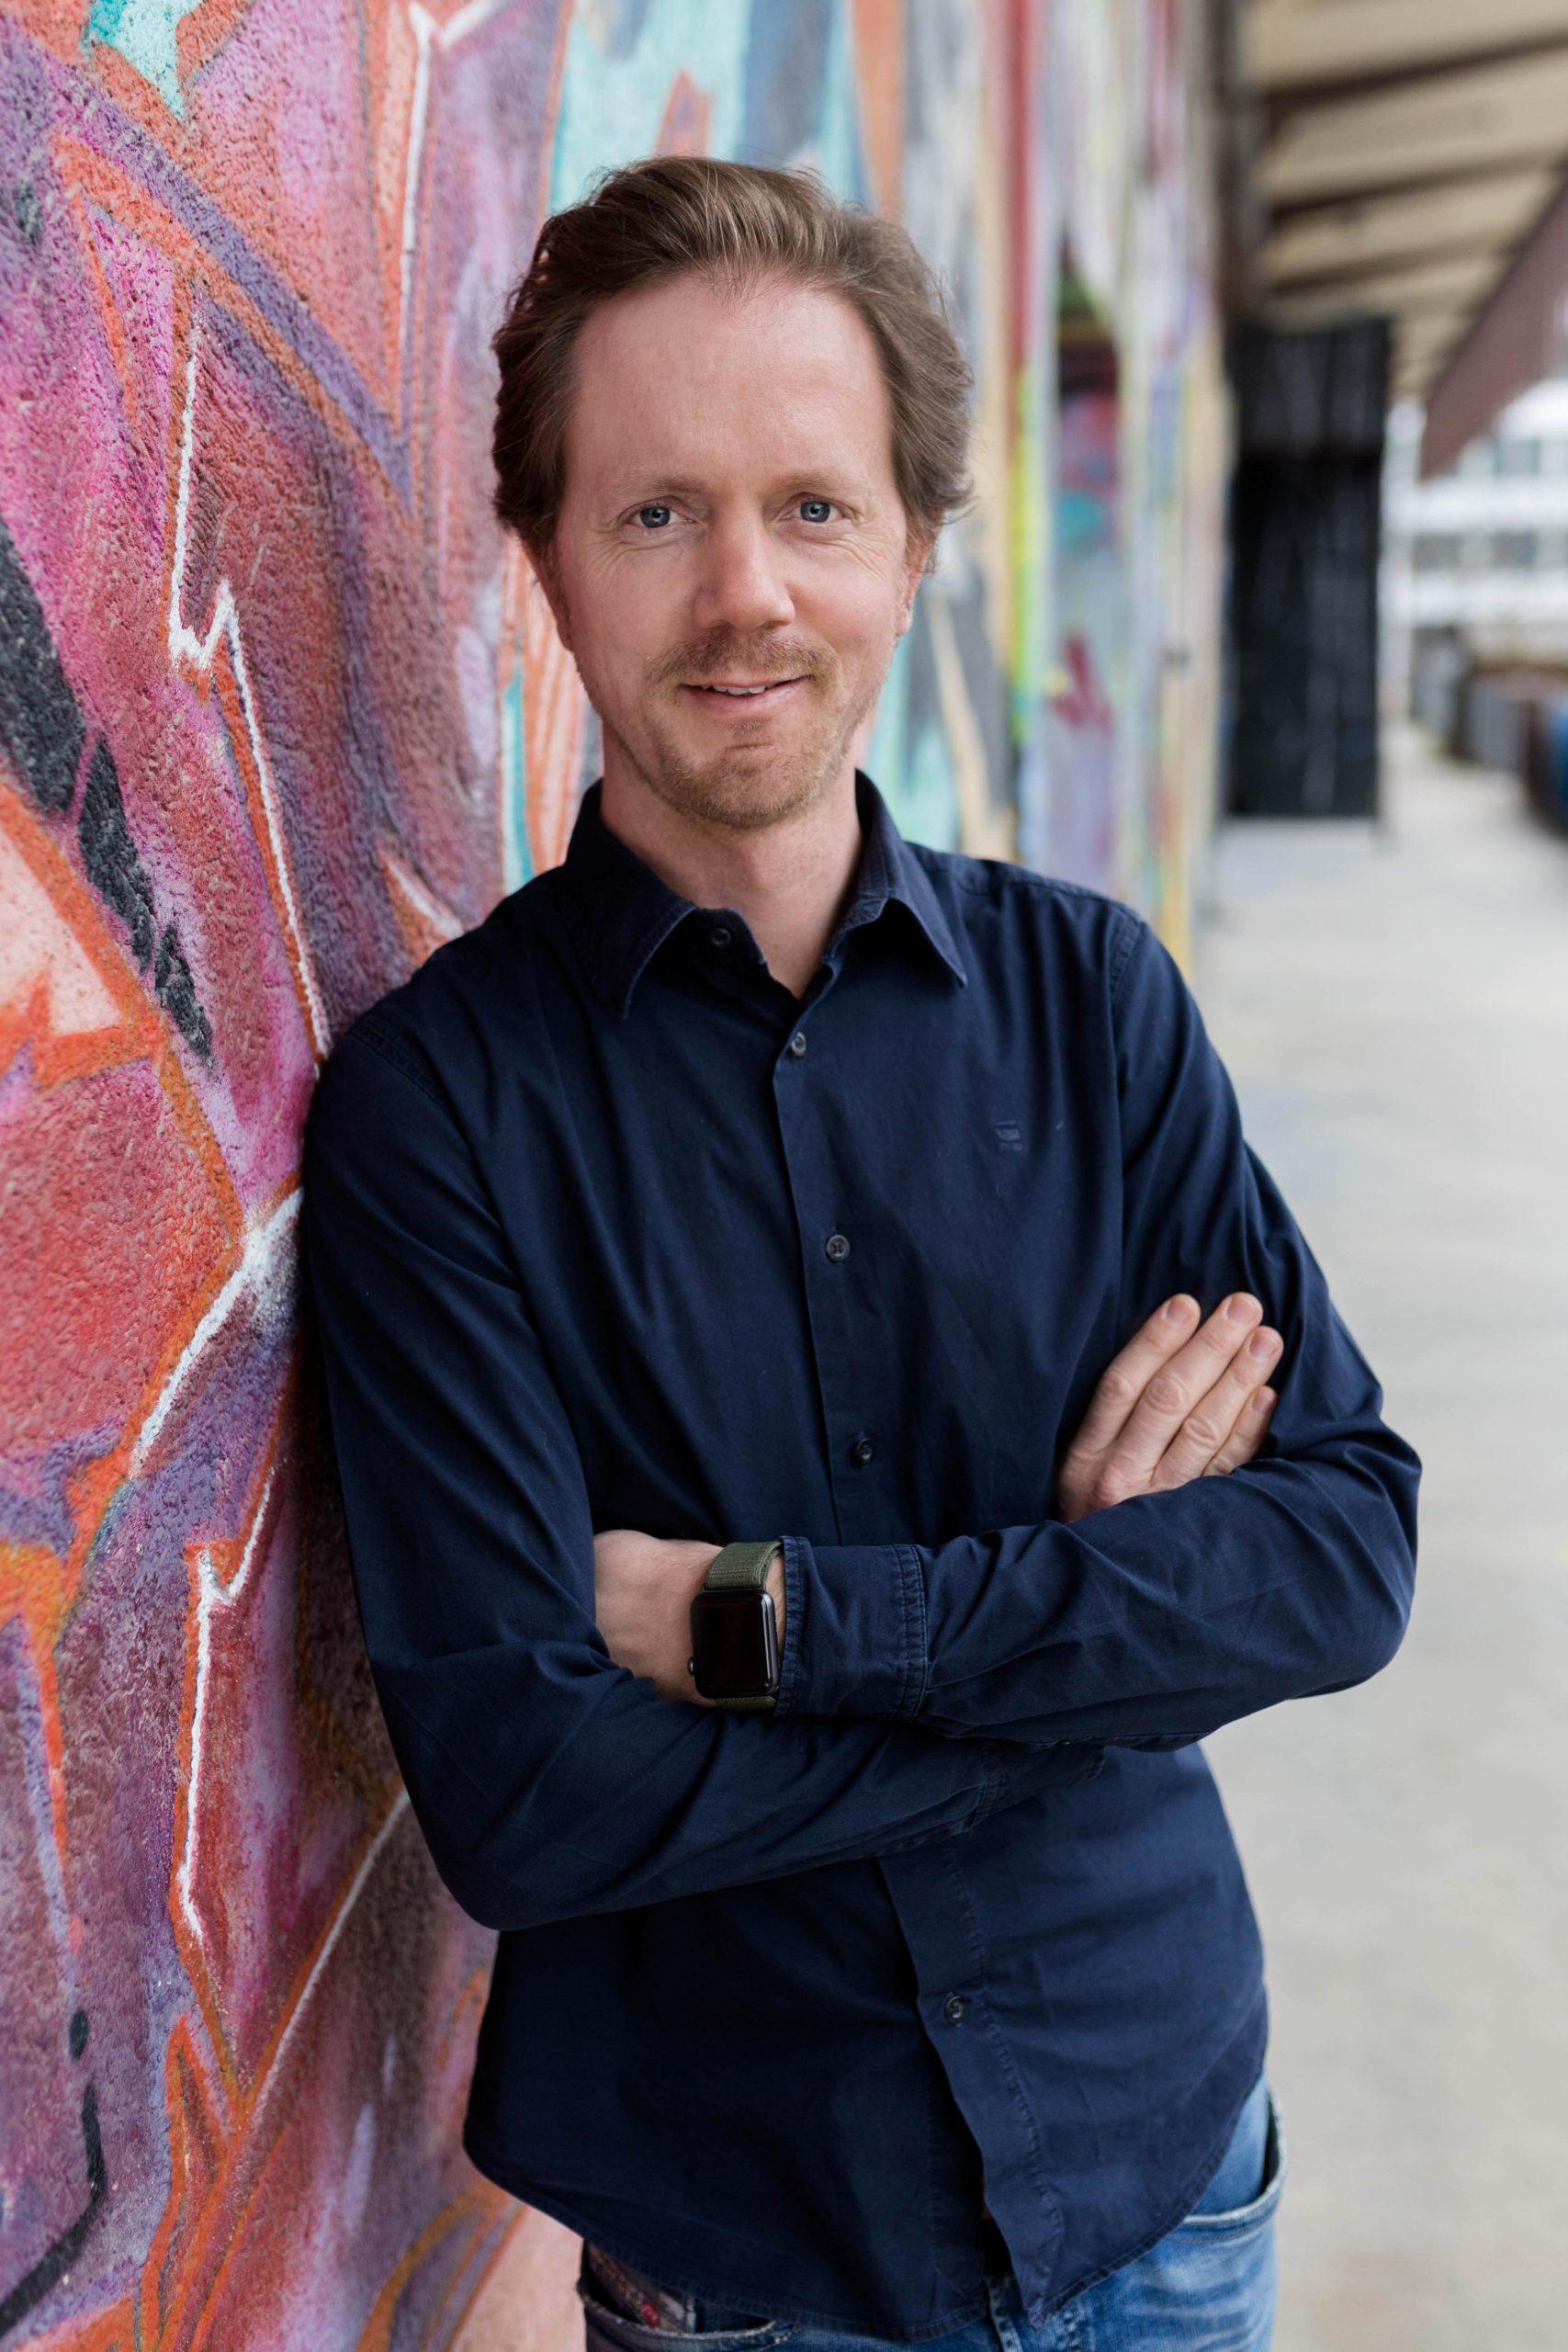 Florian Bild